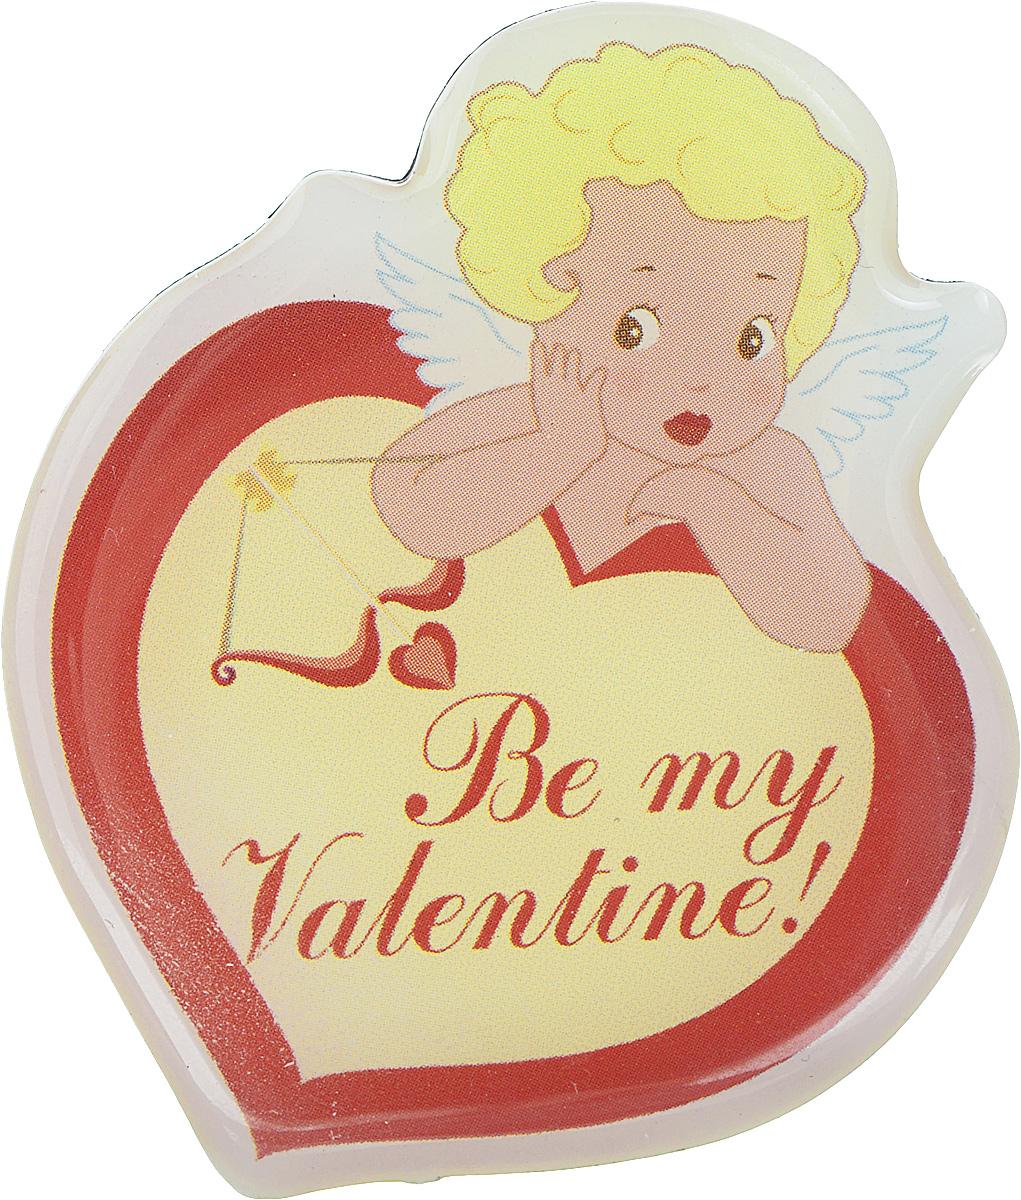 Магнит Феникс-презент Be My Valentine!, 6 x 5 см декоративный подсвечник be my valentine со свечой цвет голубой 31306